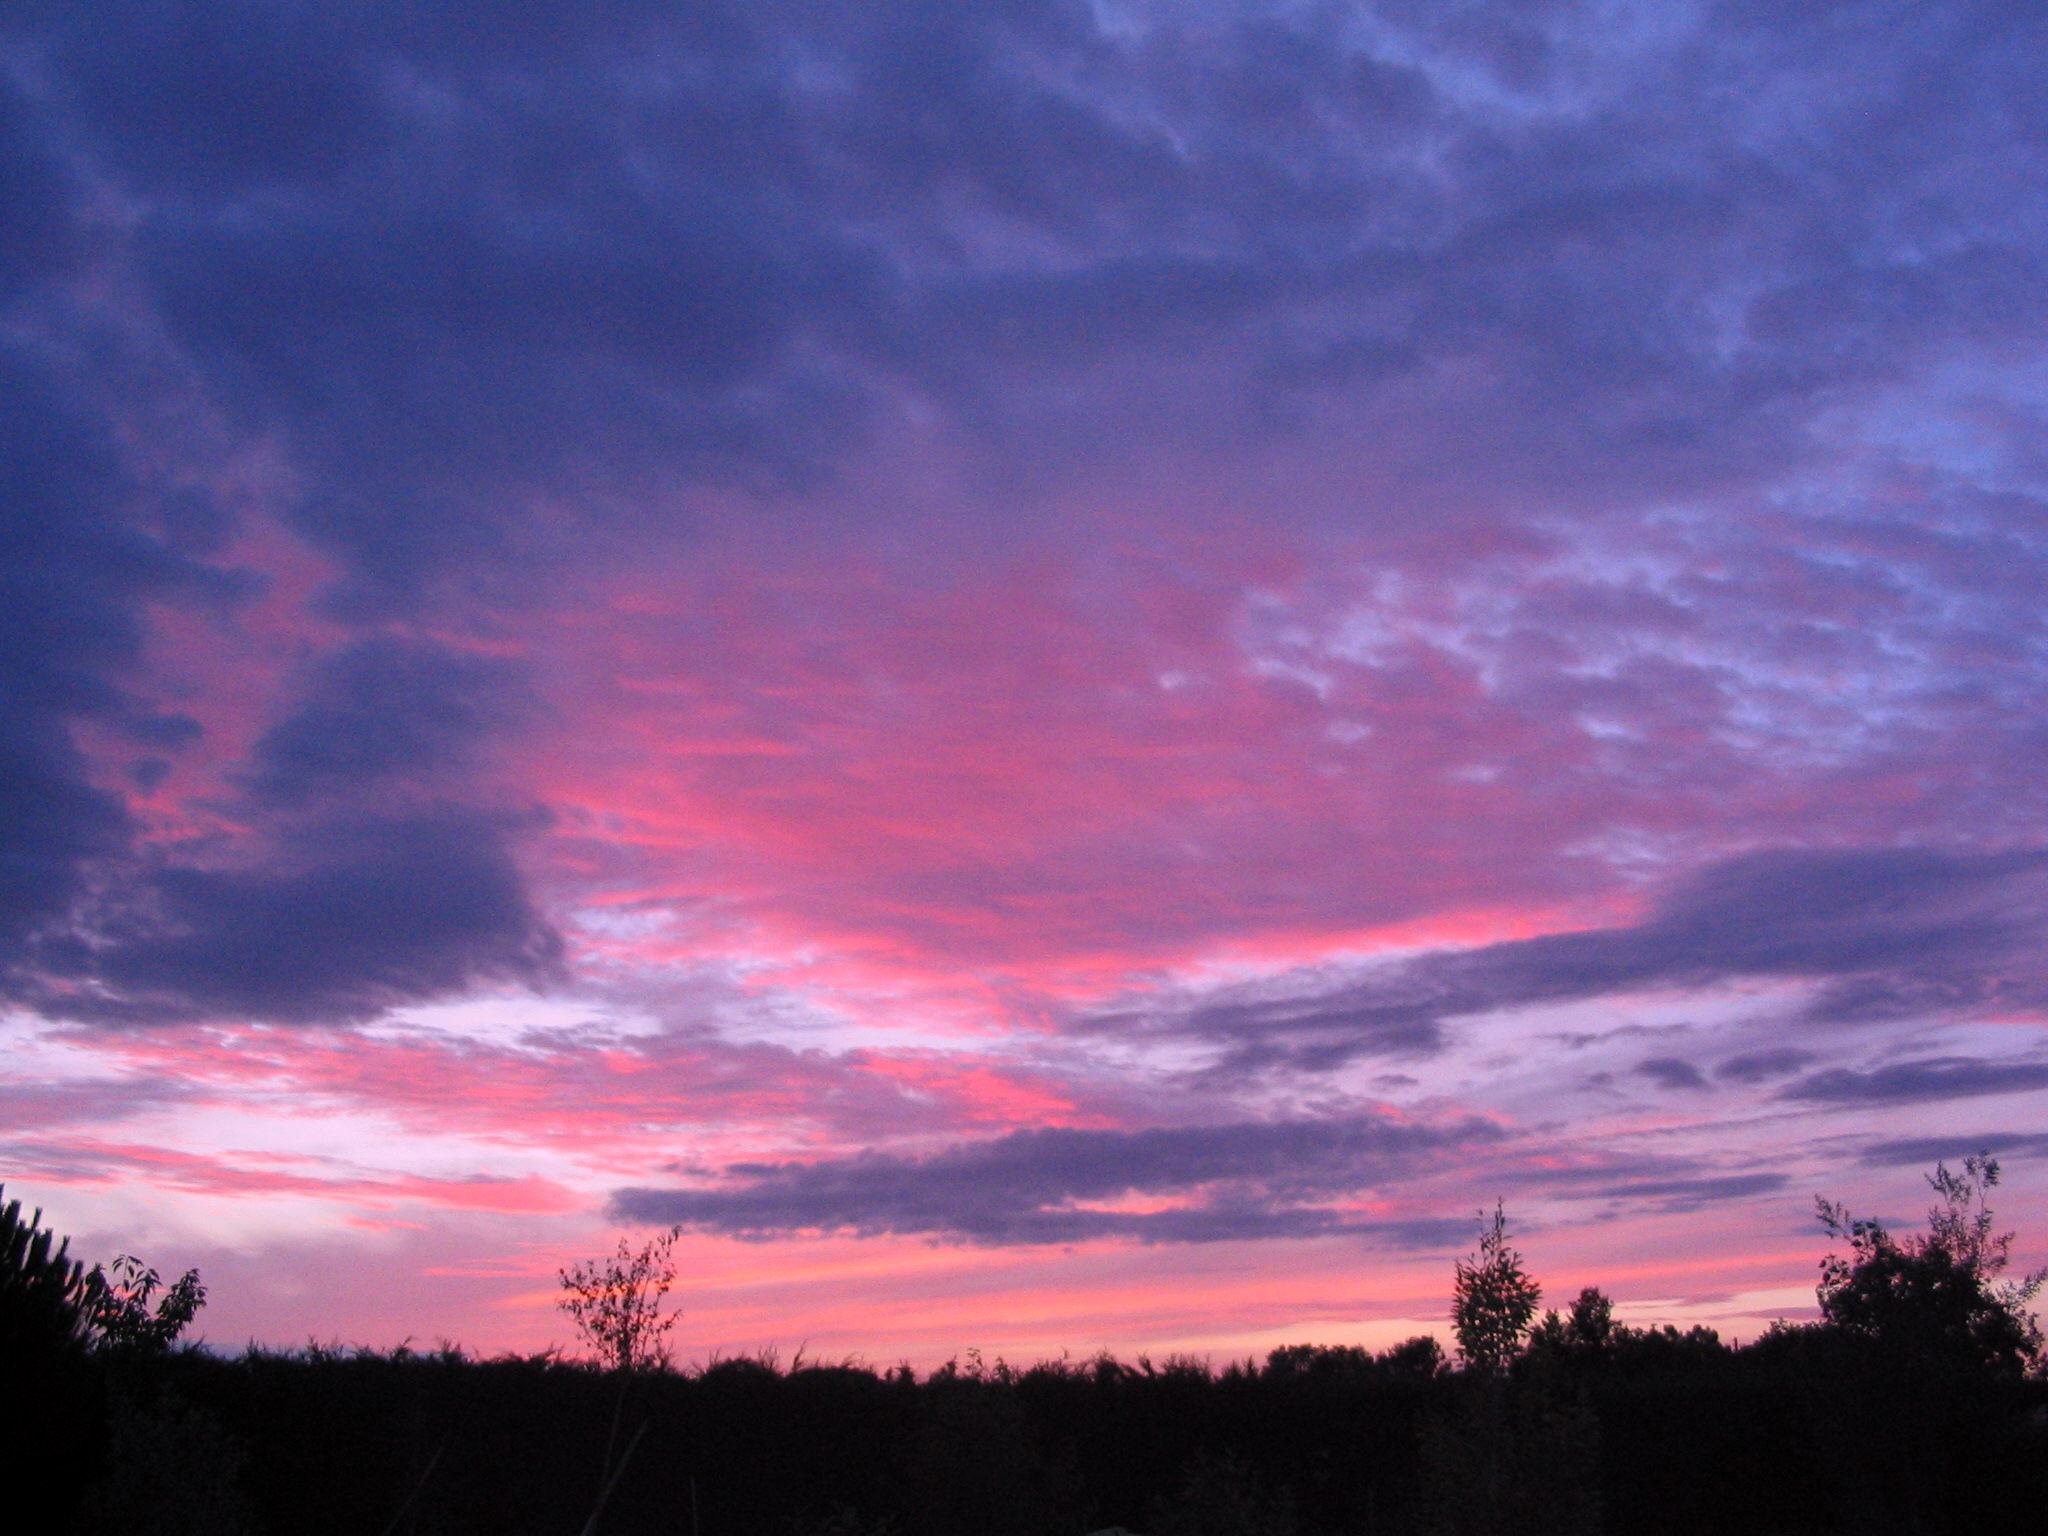 Purple Sky at night? by xXRookieXx on DeviantArt